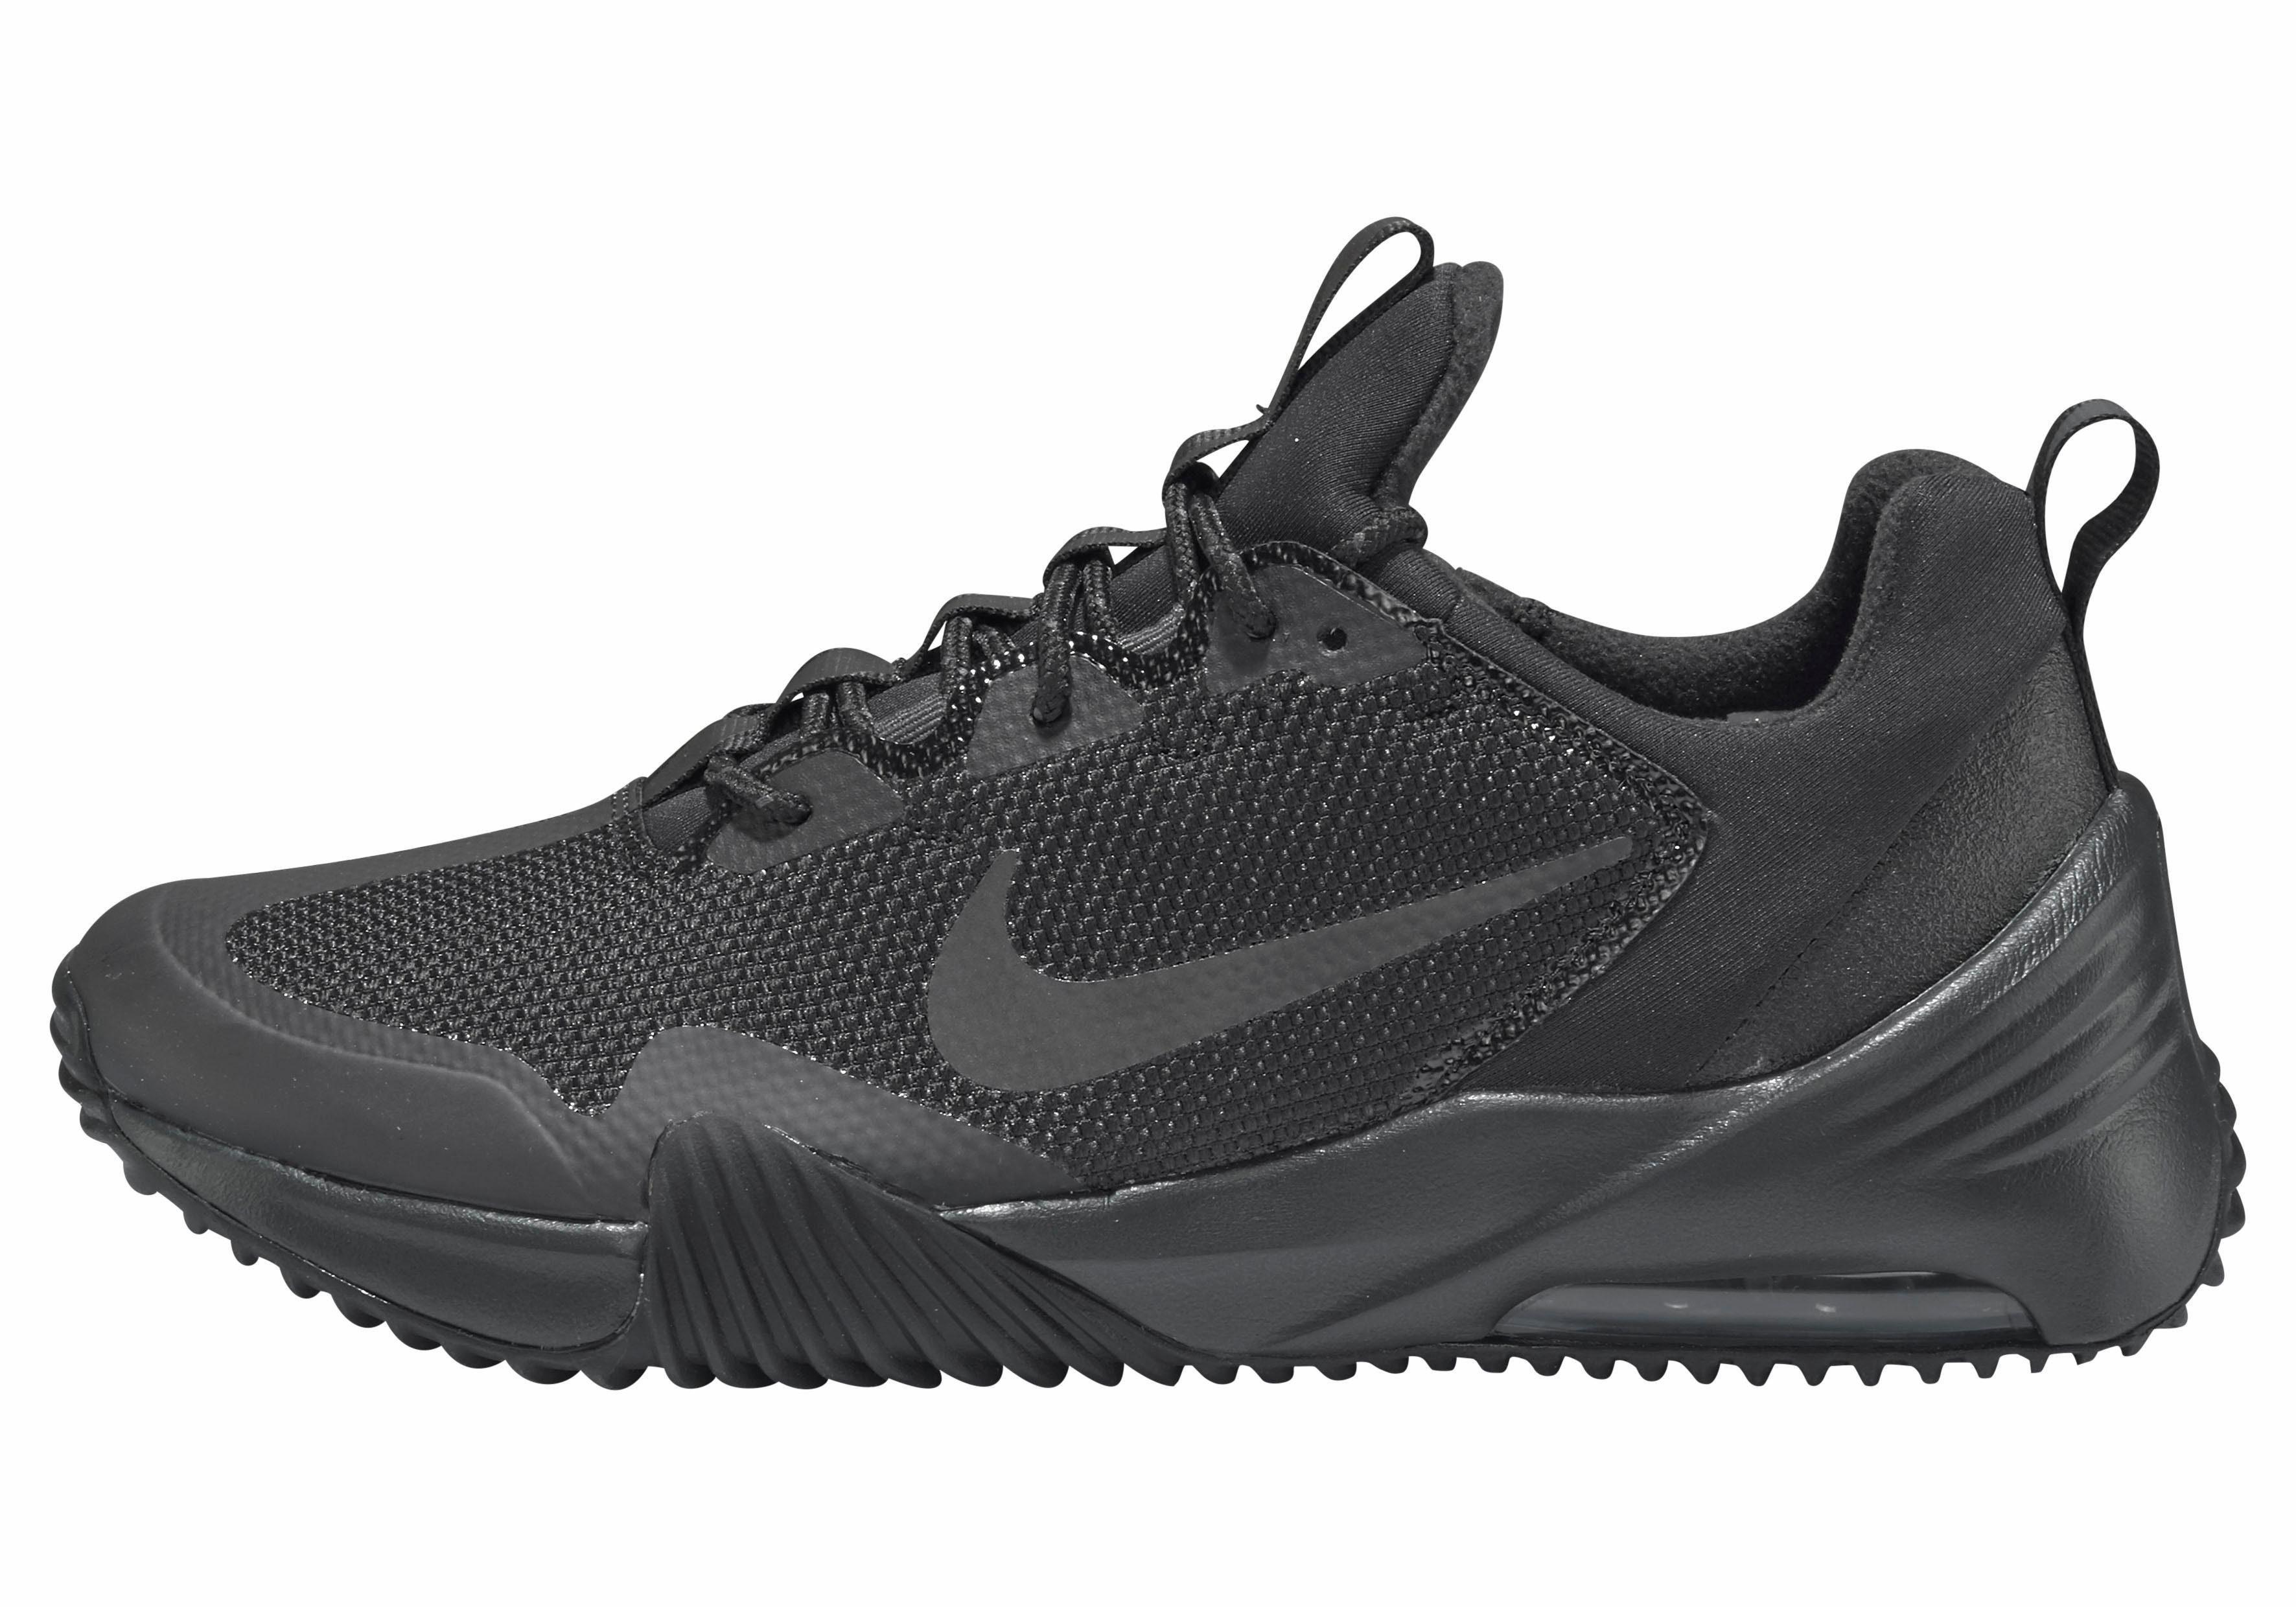 Nike Sneakers Couche Noire Occasionnels « Air Max Grigora ' zmlDIp8Nl